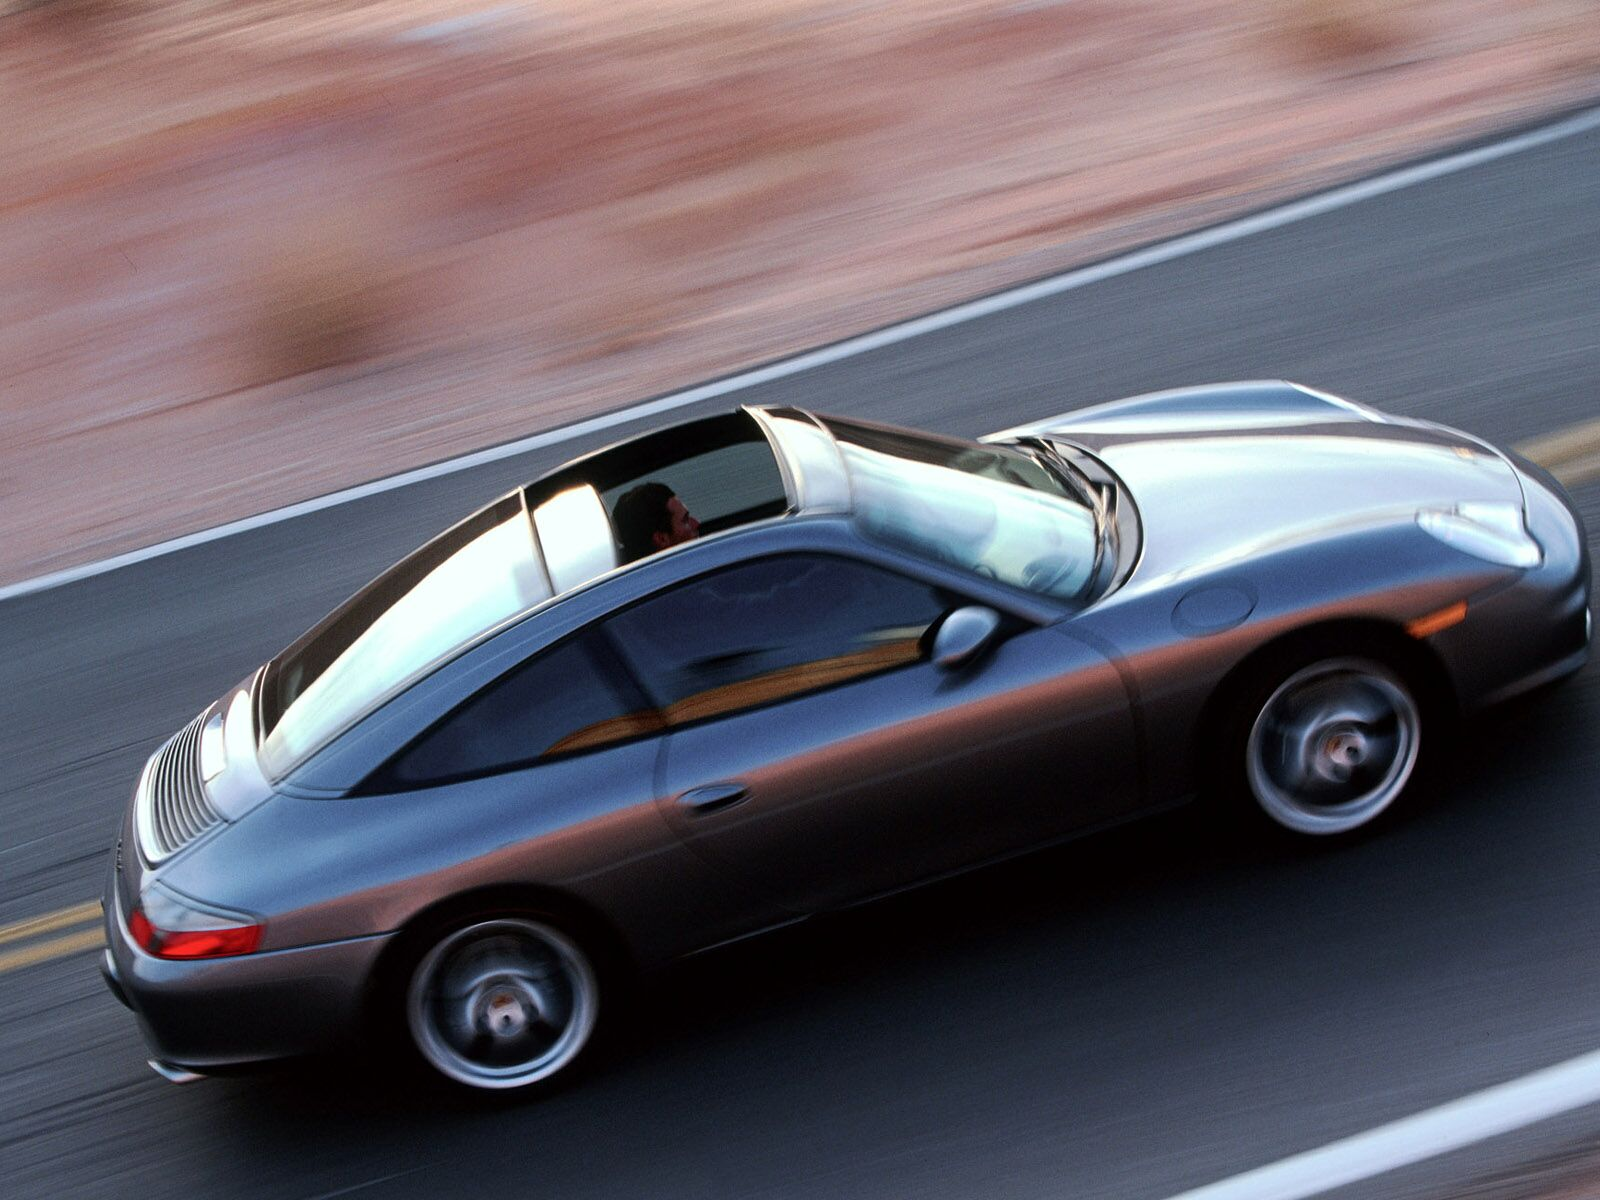 porsche 911 targa 996 3 6 carrera 320 ps auto technische daten leistung torque tankinhalt. Black Bedroom Furniture Sets. Home Design Ideas